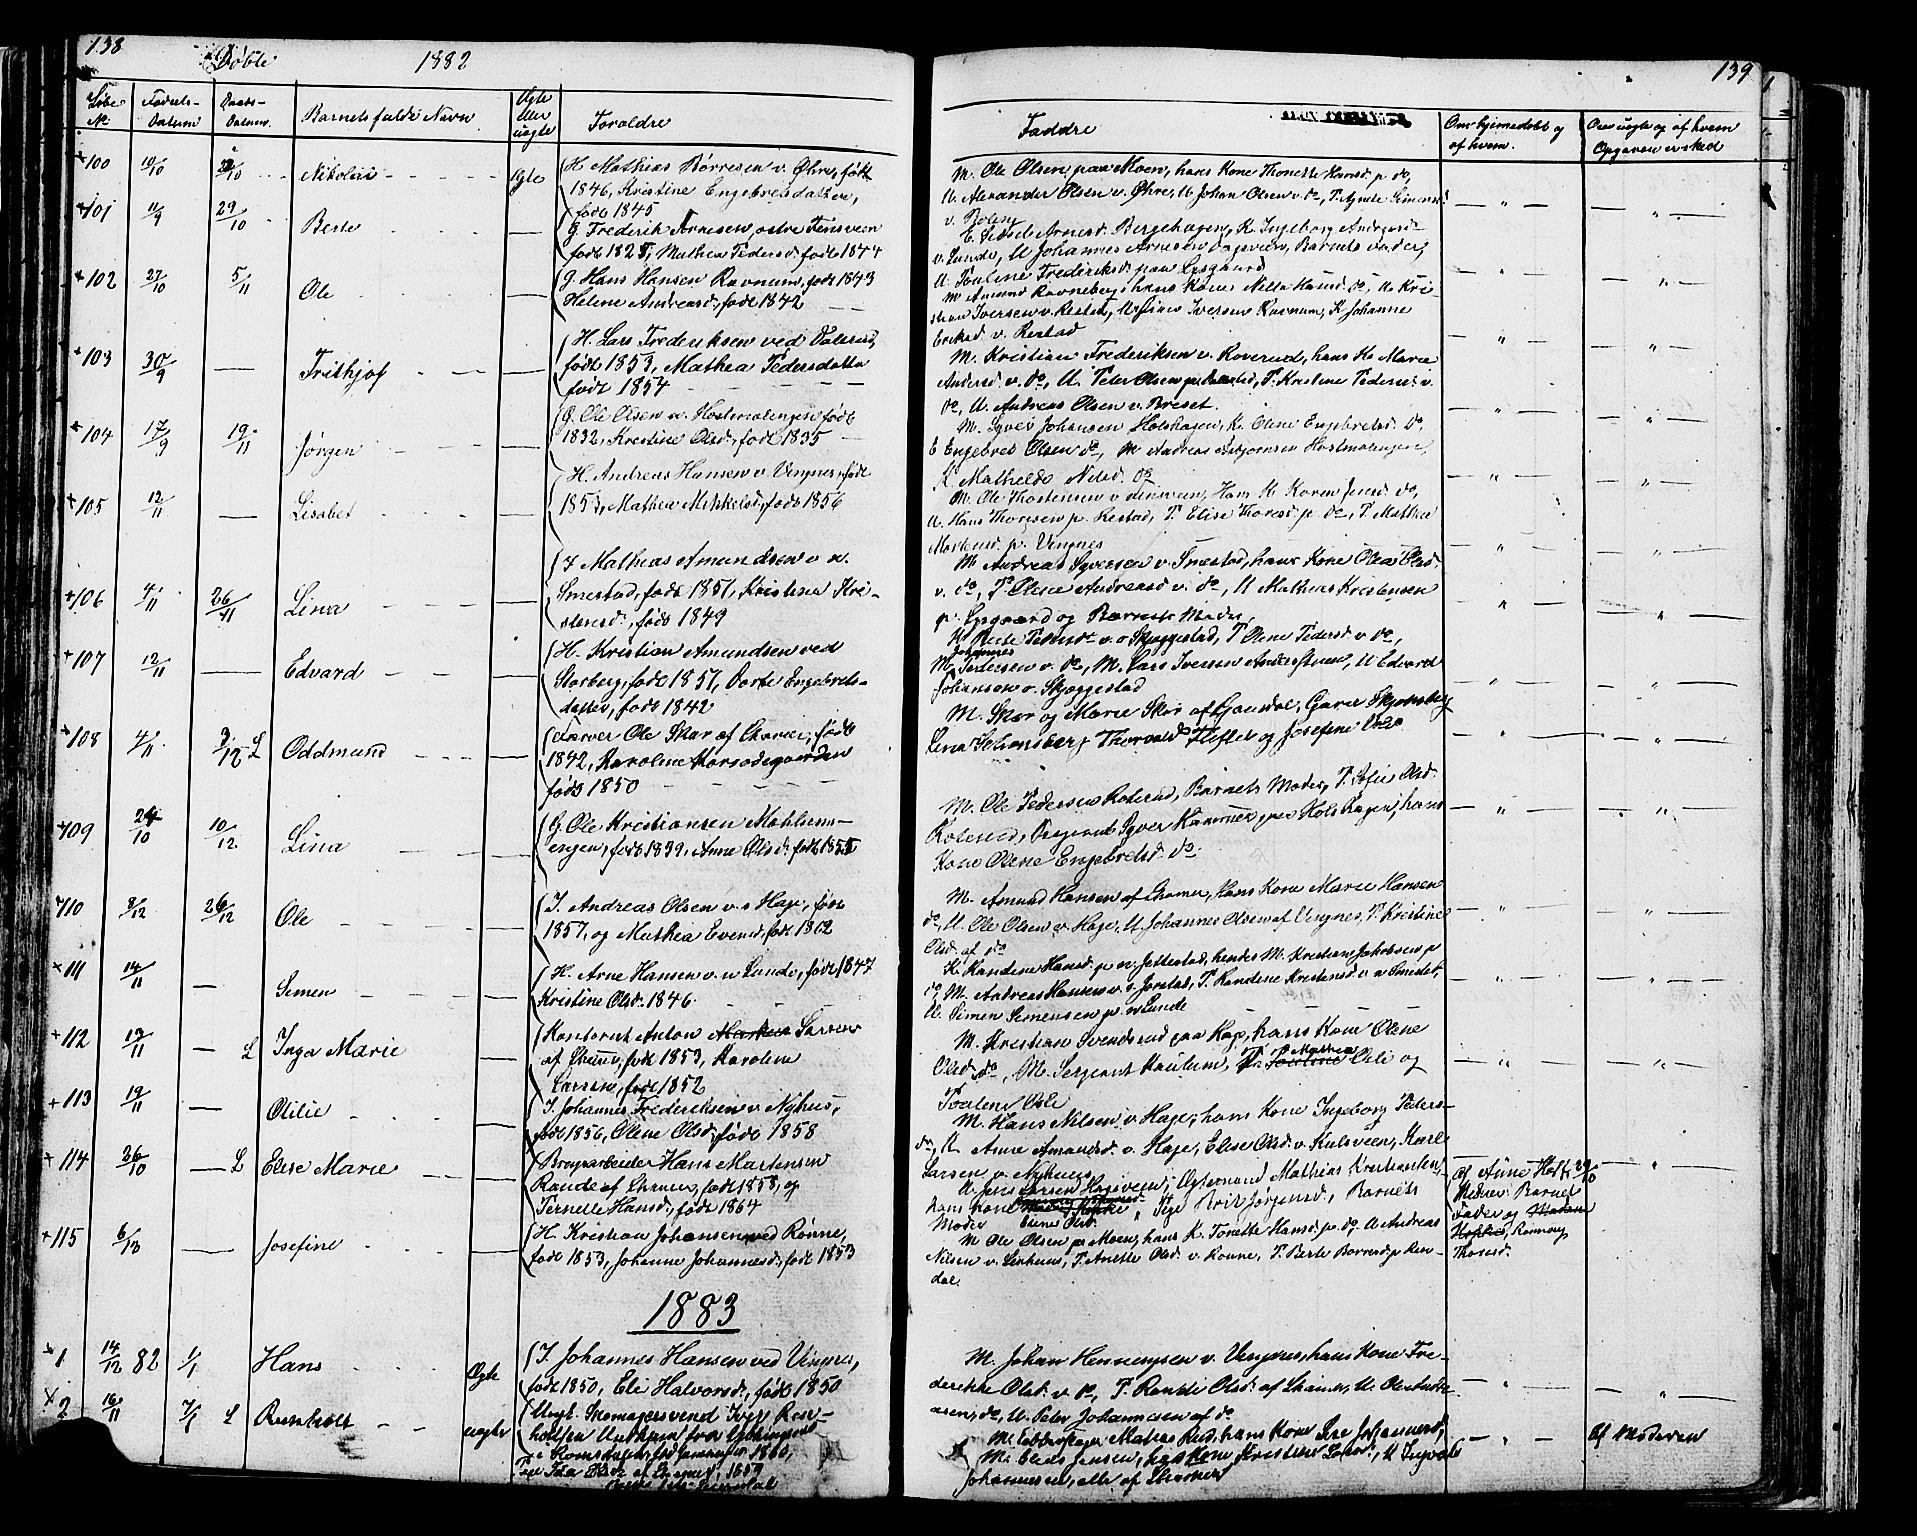 SAH, Fåberg prestekontor, Klokkerbok nr. 7, 1856-1891, s. 138-139